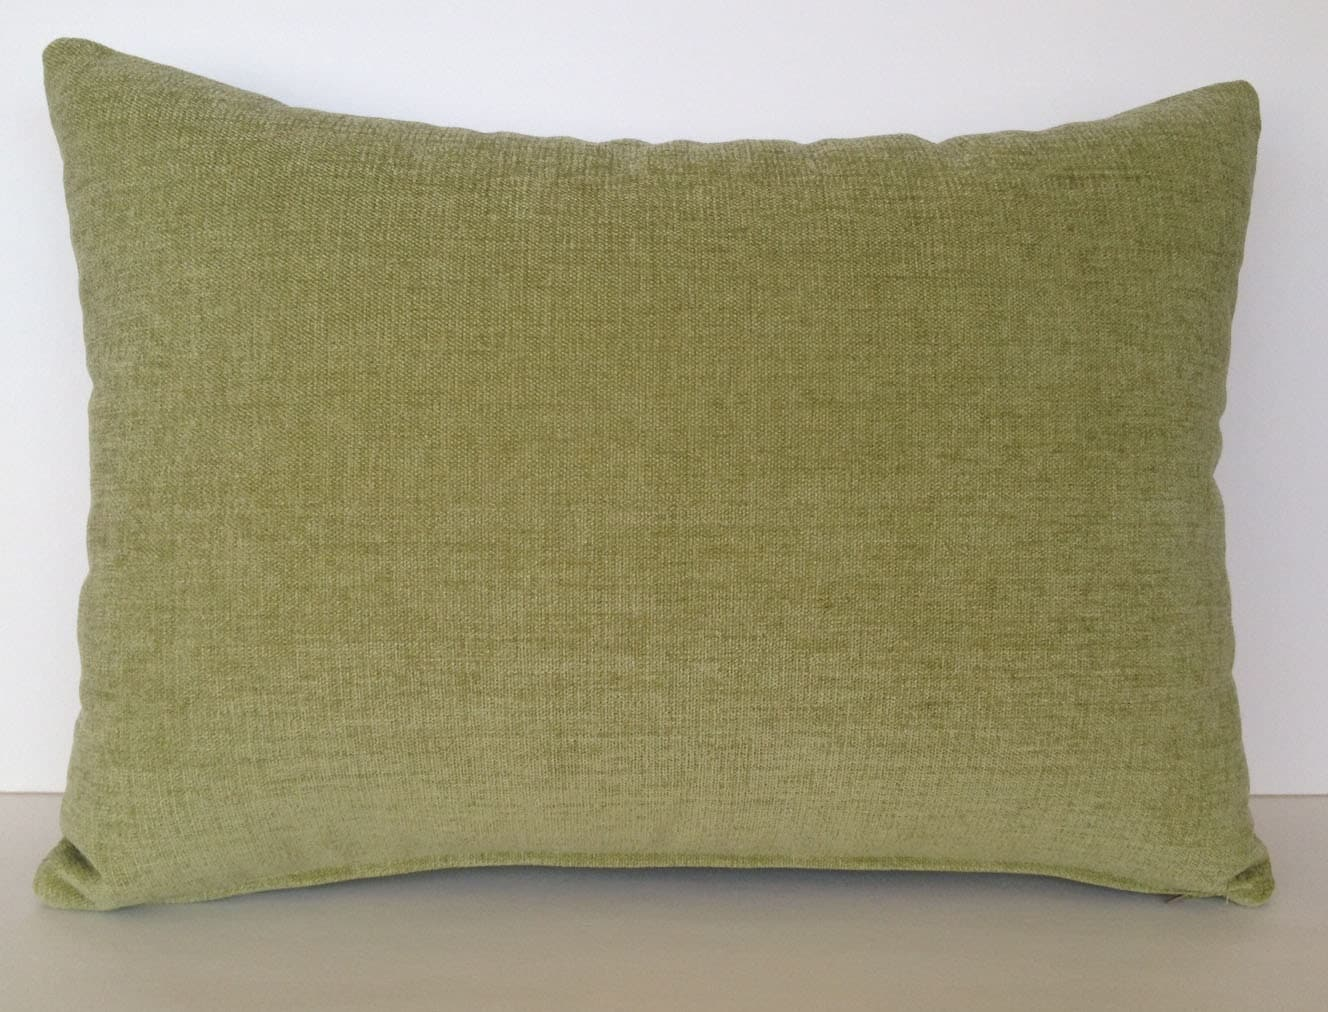 Celery Green Throw Pillow : 20 x 14 Lumbar Pillow Cover Celery Green Lime